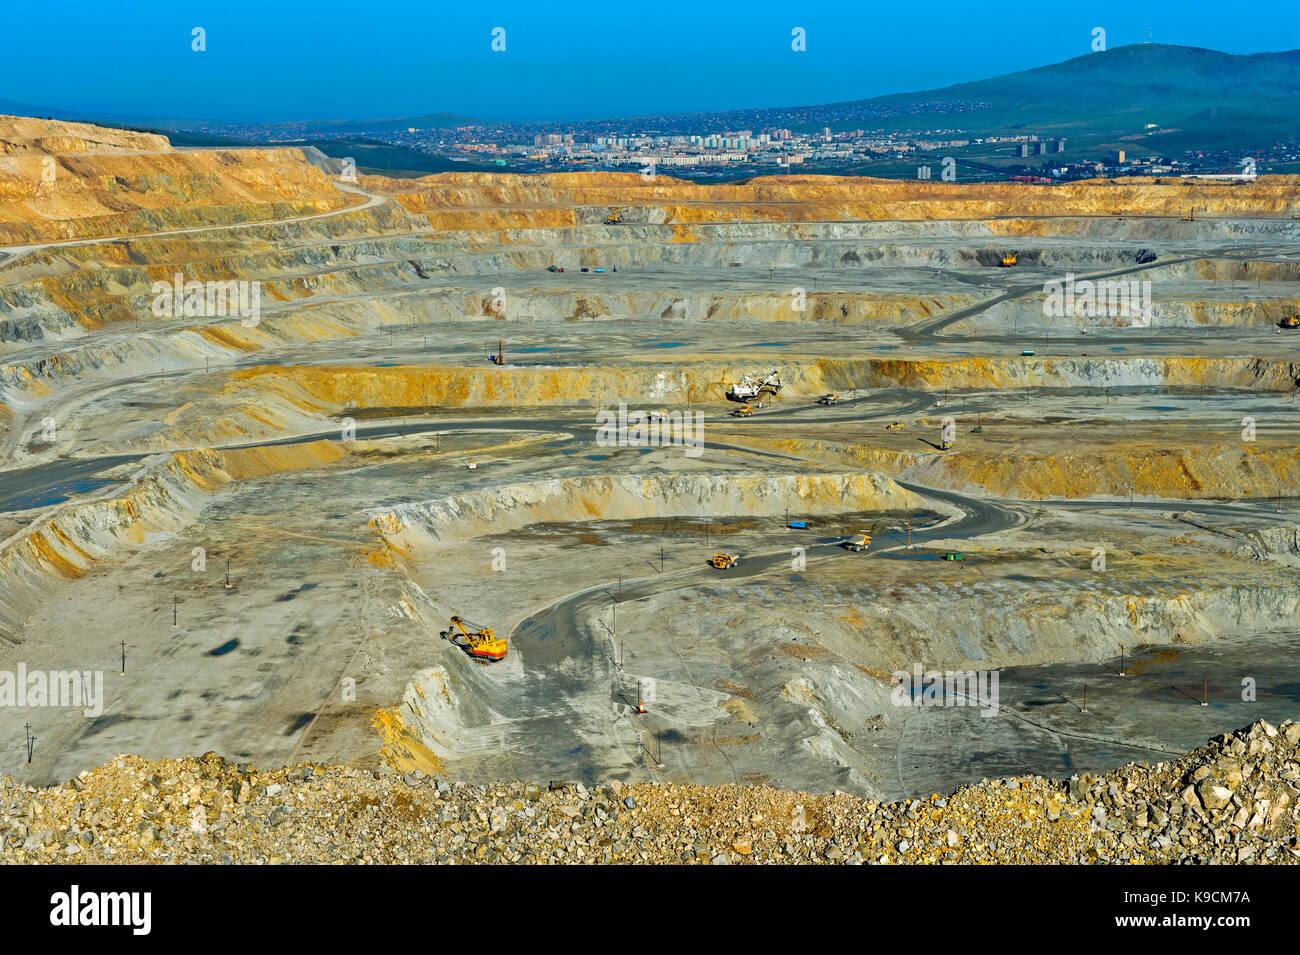 Benches of an open-pit copper mine of the Erdenet Mining Corporation EMC, city of Erdenet behind, Erdenet, Mongolia - Stock Image